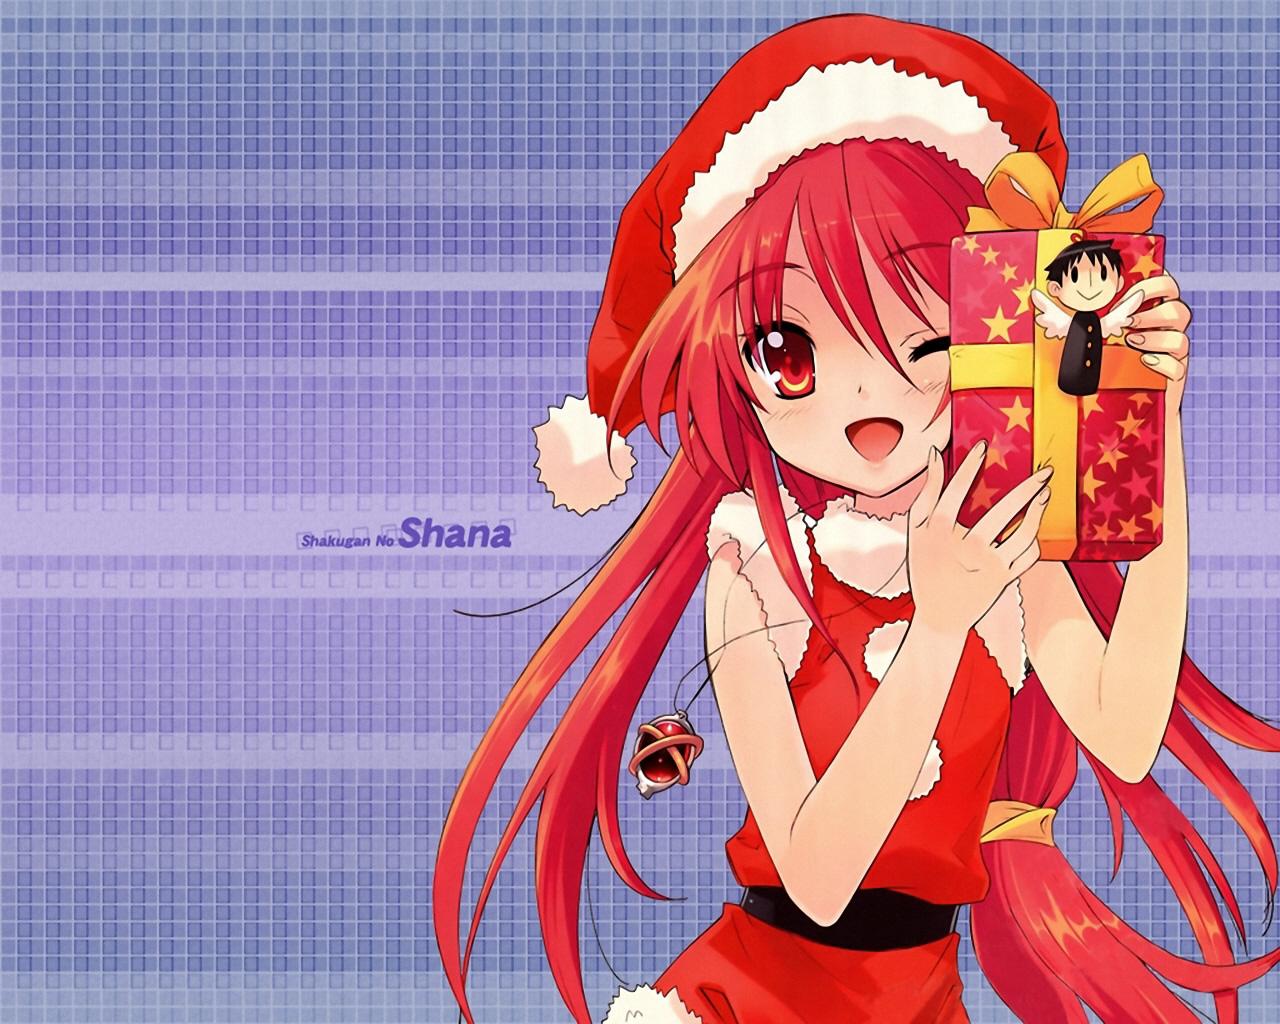 Anime Christmas Girls 9 Wide Wallpaper - Animewp.com